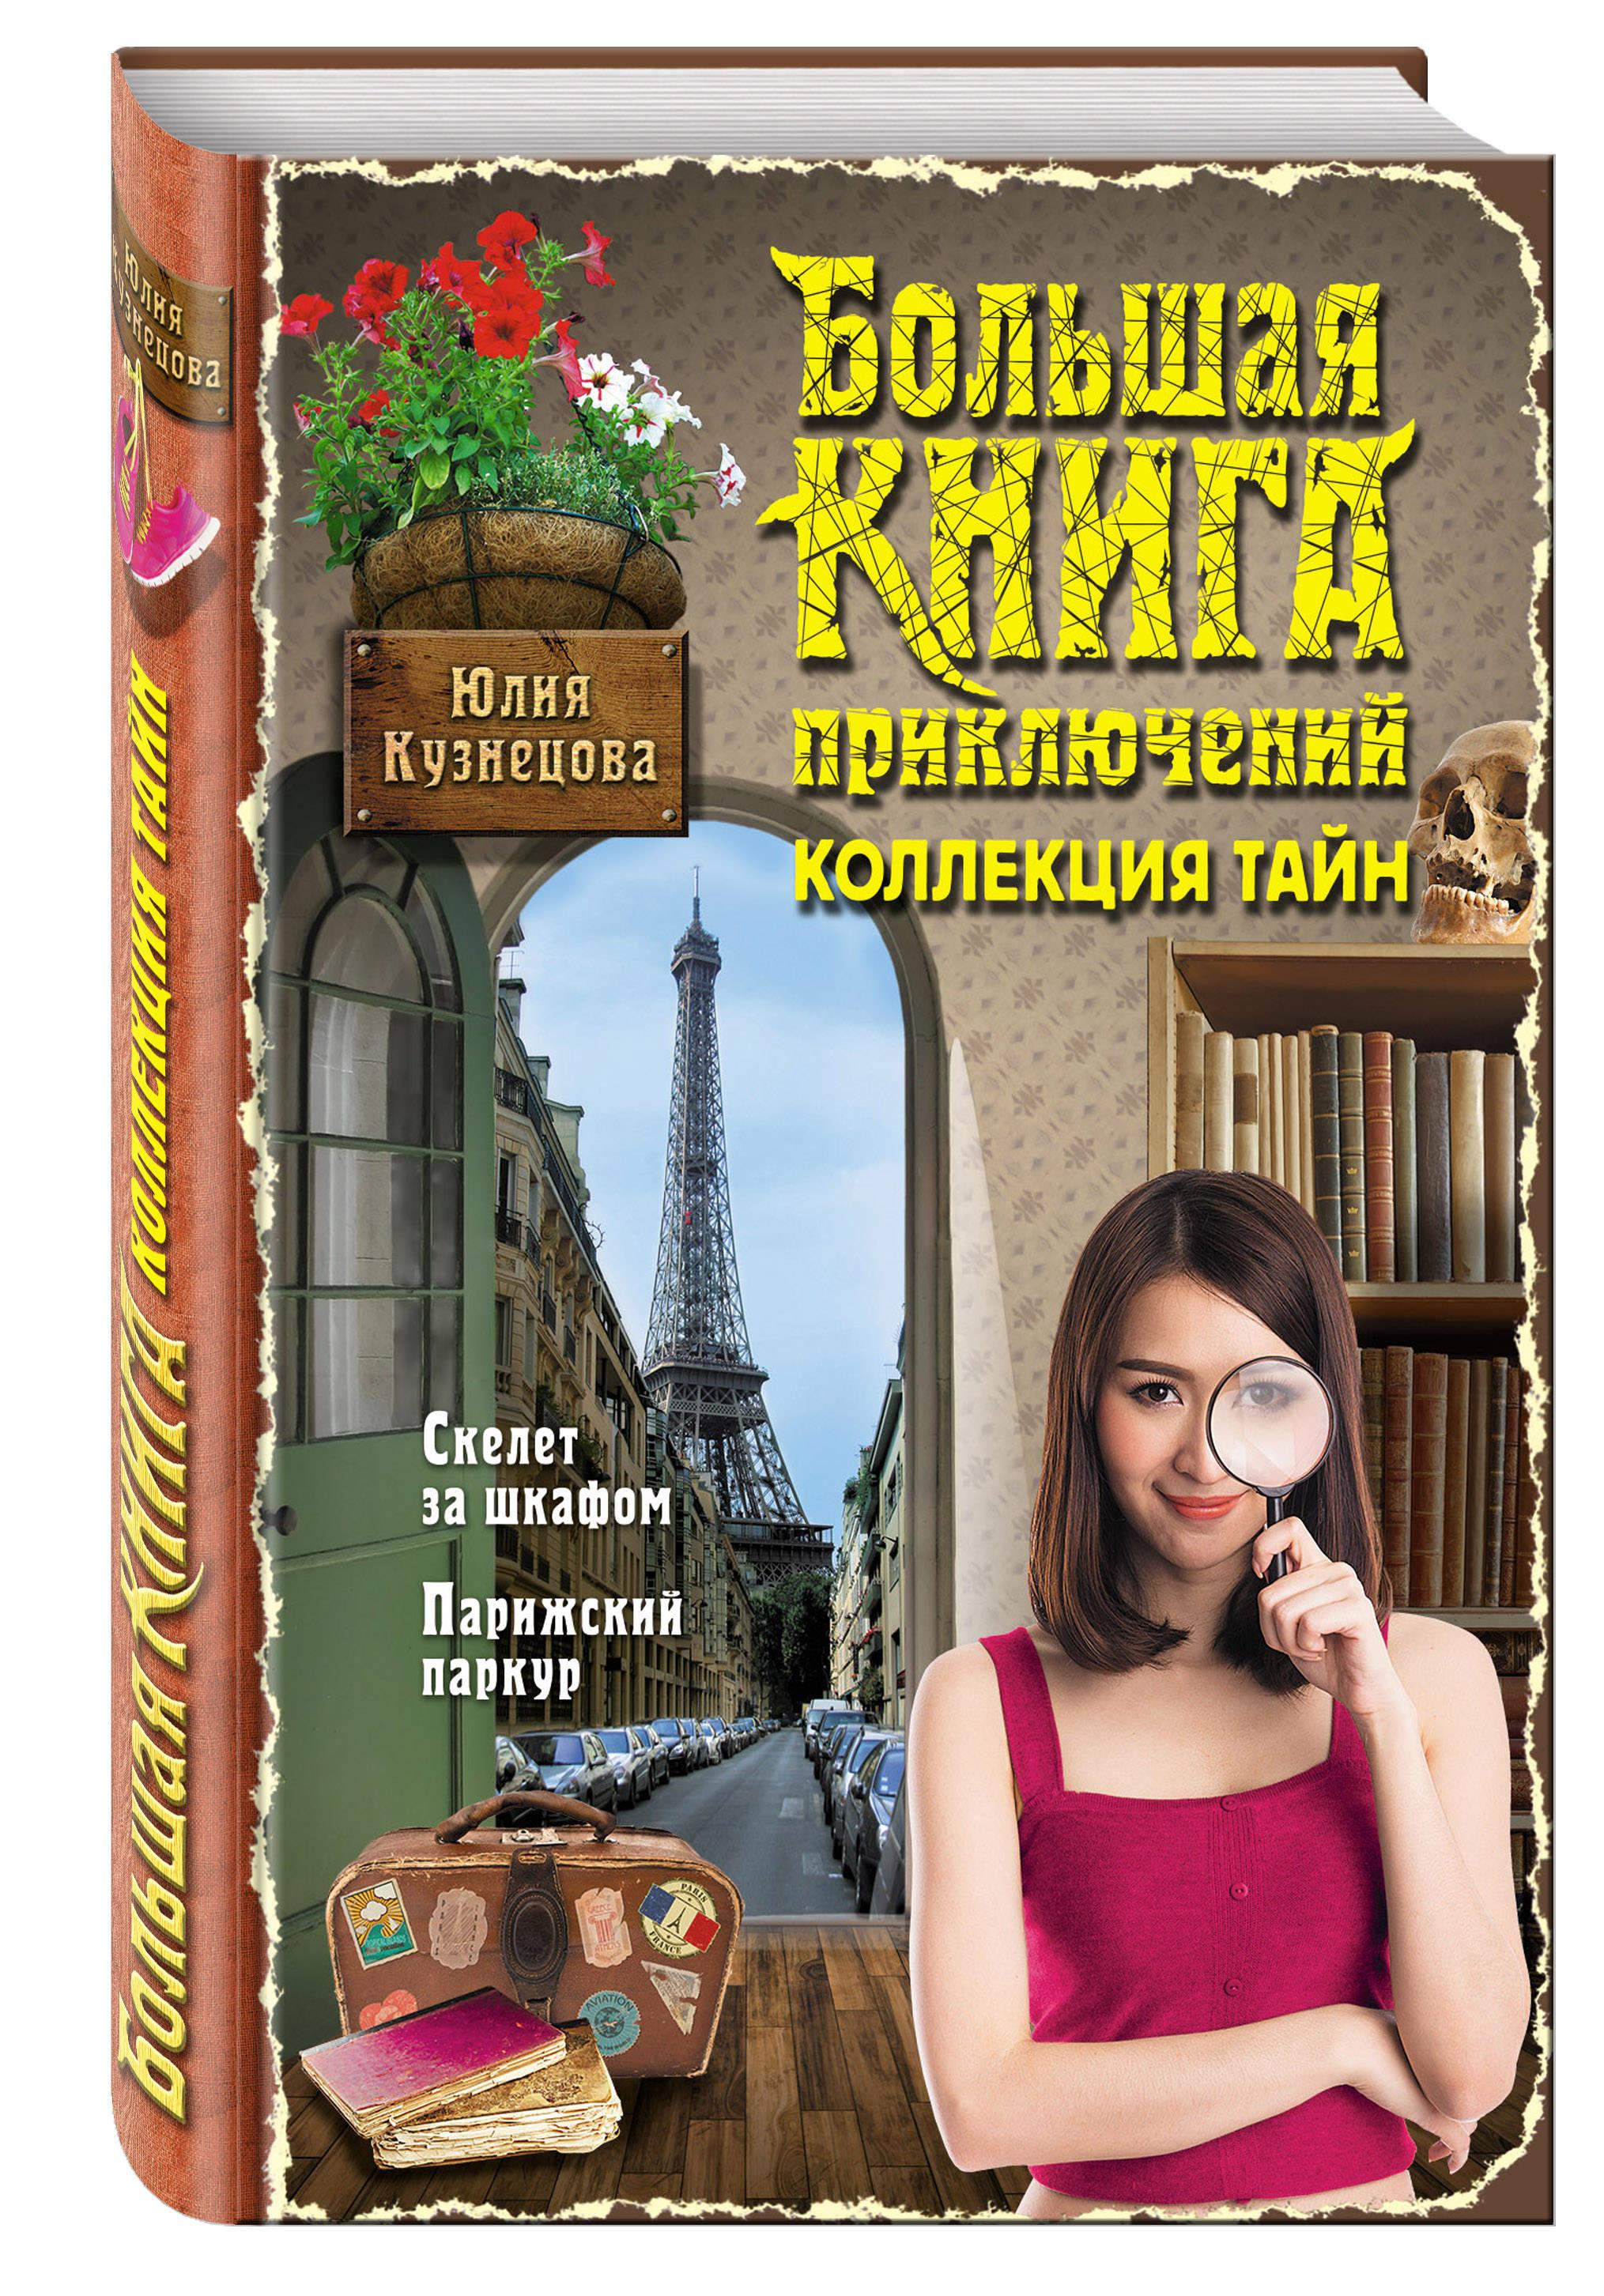 Большая книга приключений. Коллекция тайн